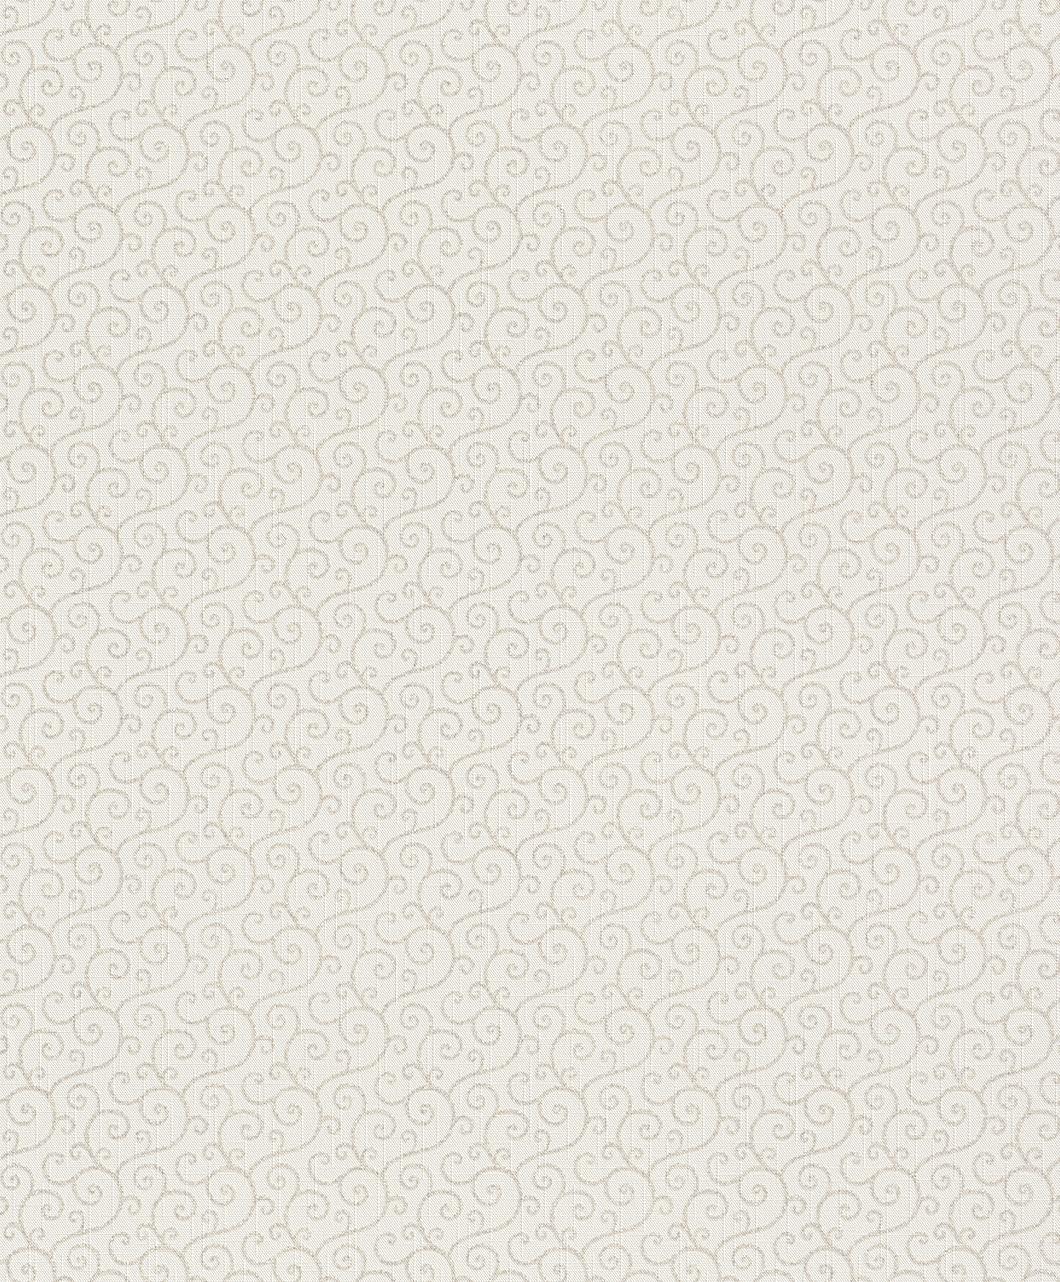 Tapeta na zeď Rasch Shiny Chic 423846 | 0,53x10,05m (Vliesové tapety - béžová, krémová)